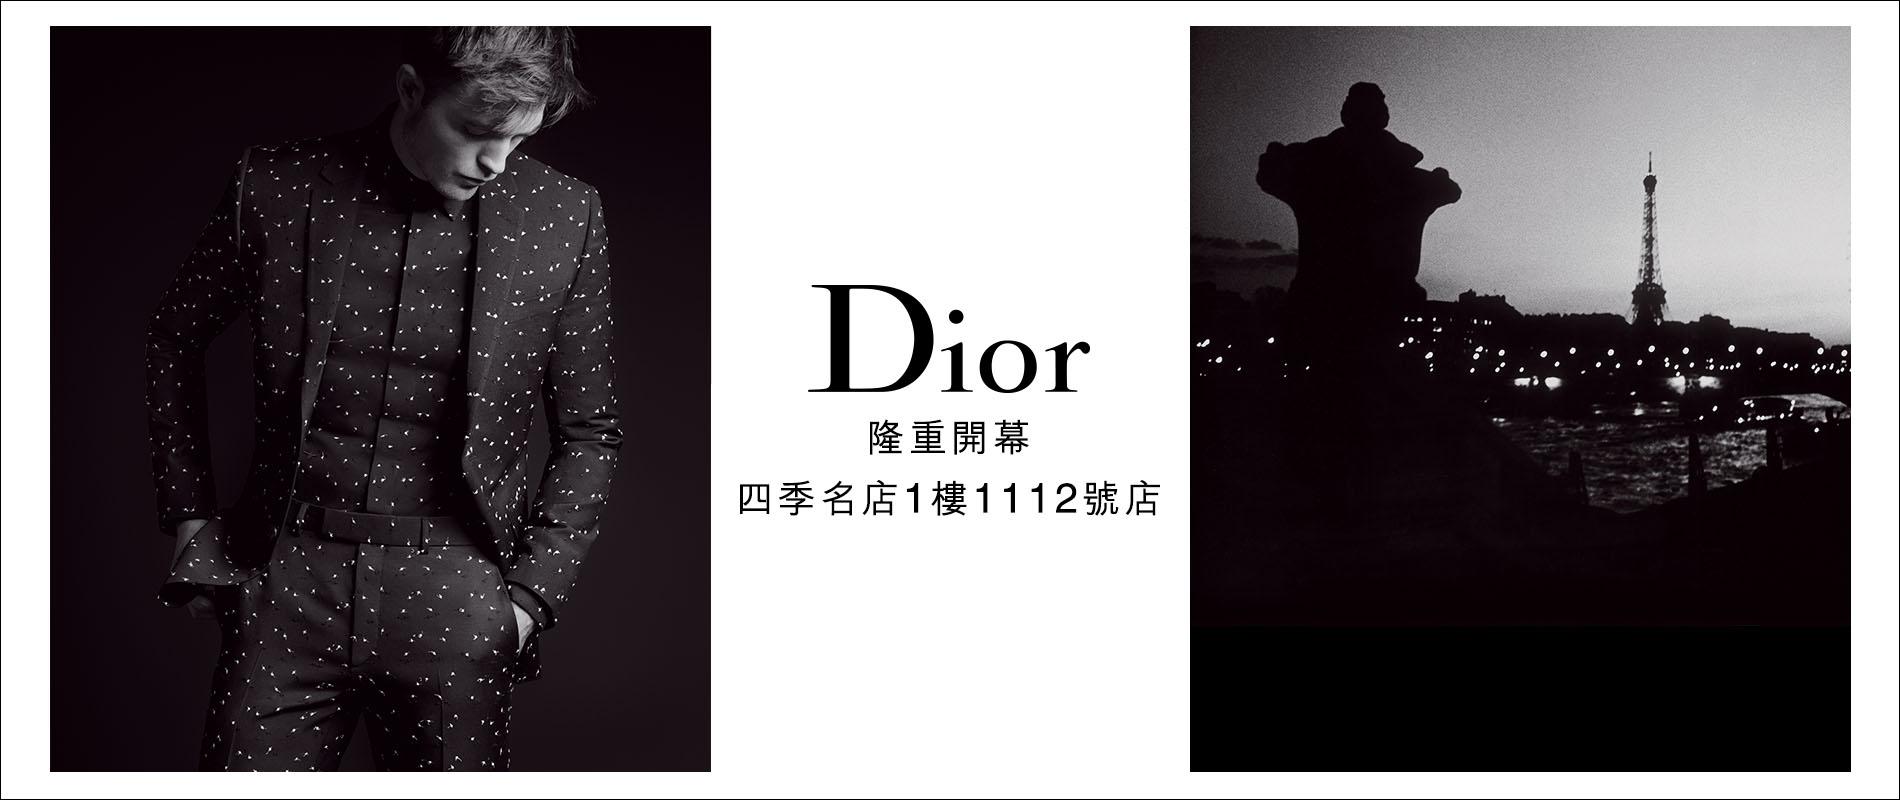 Dior 迪奧